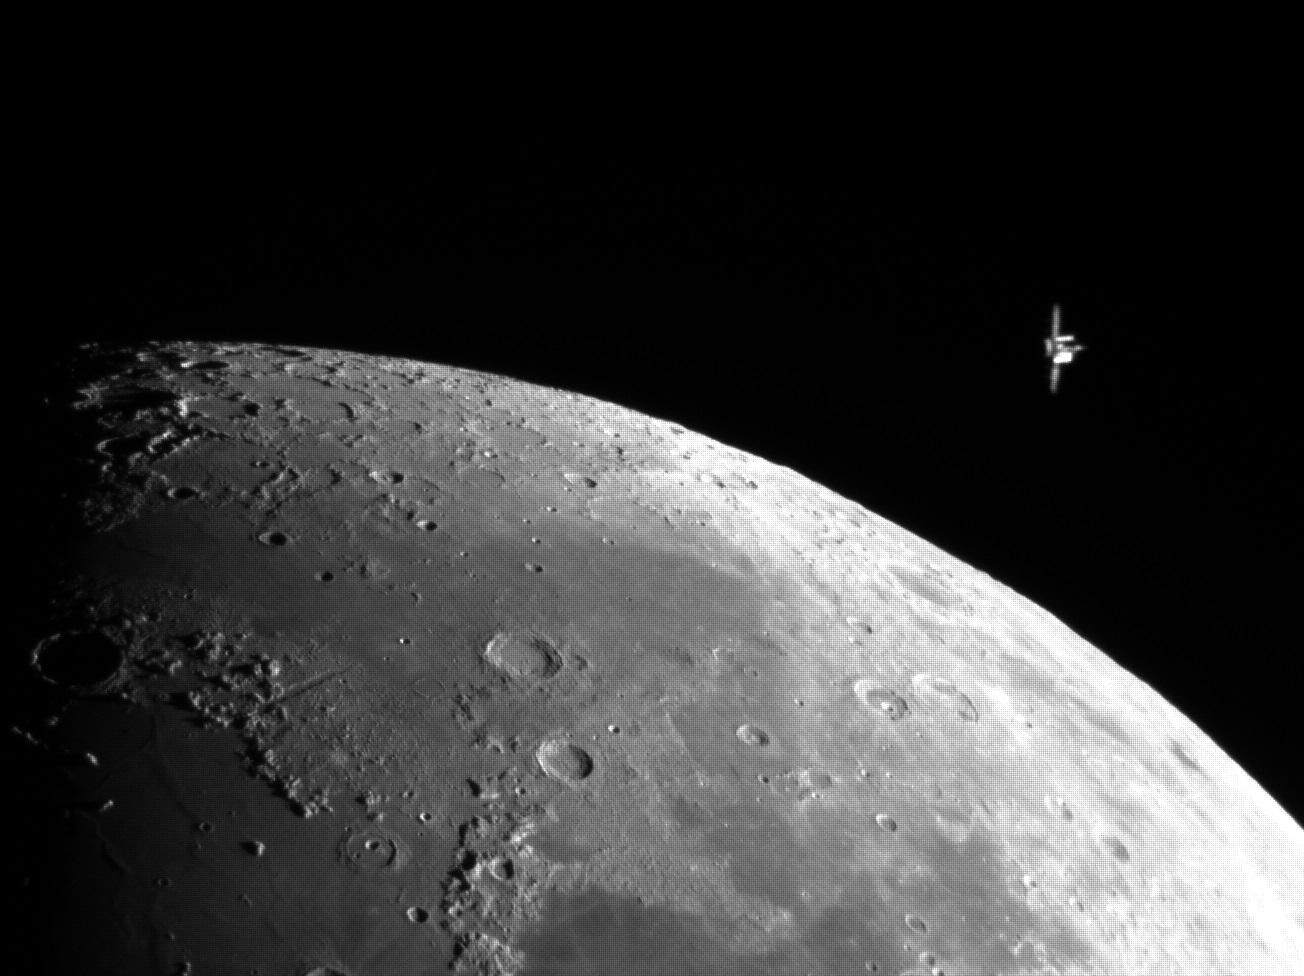 Moon_210216_010420_F_00000048.jpg